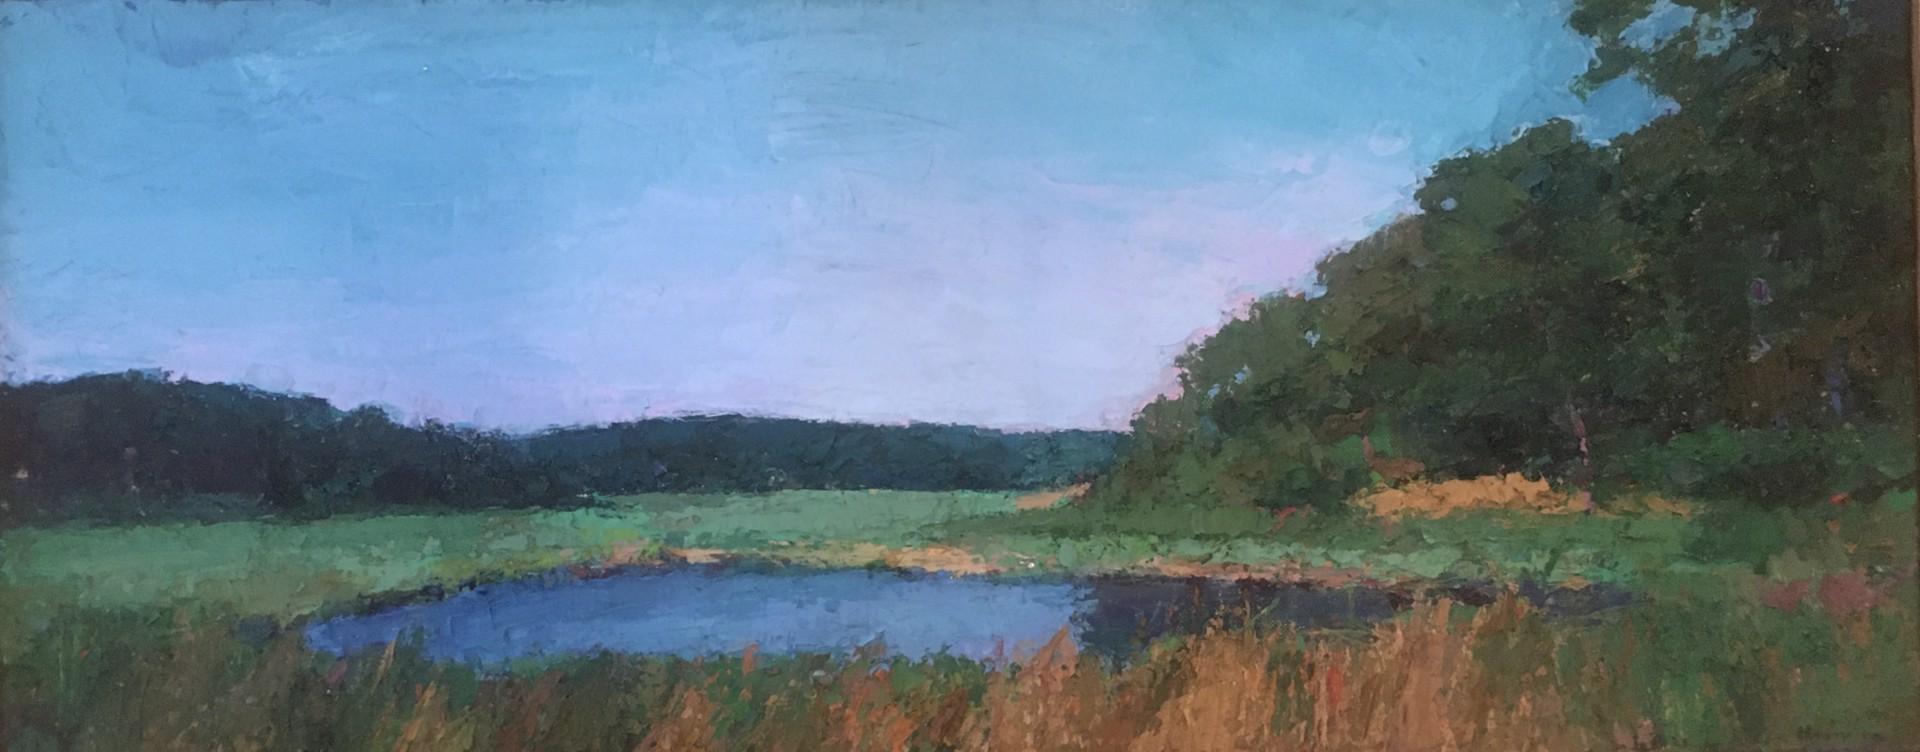 Tidal Marsh by Larry Horowitz